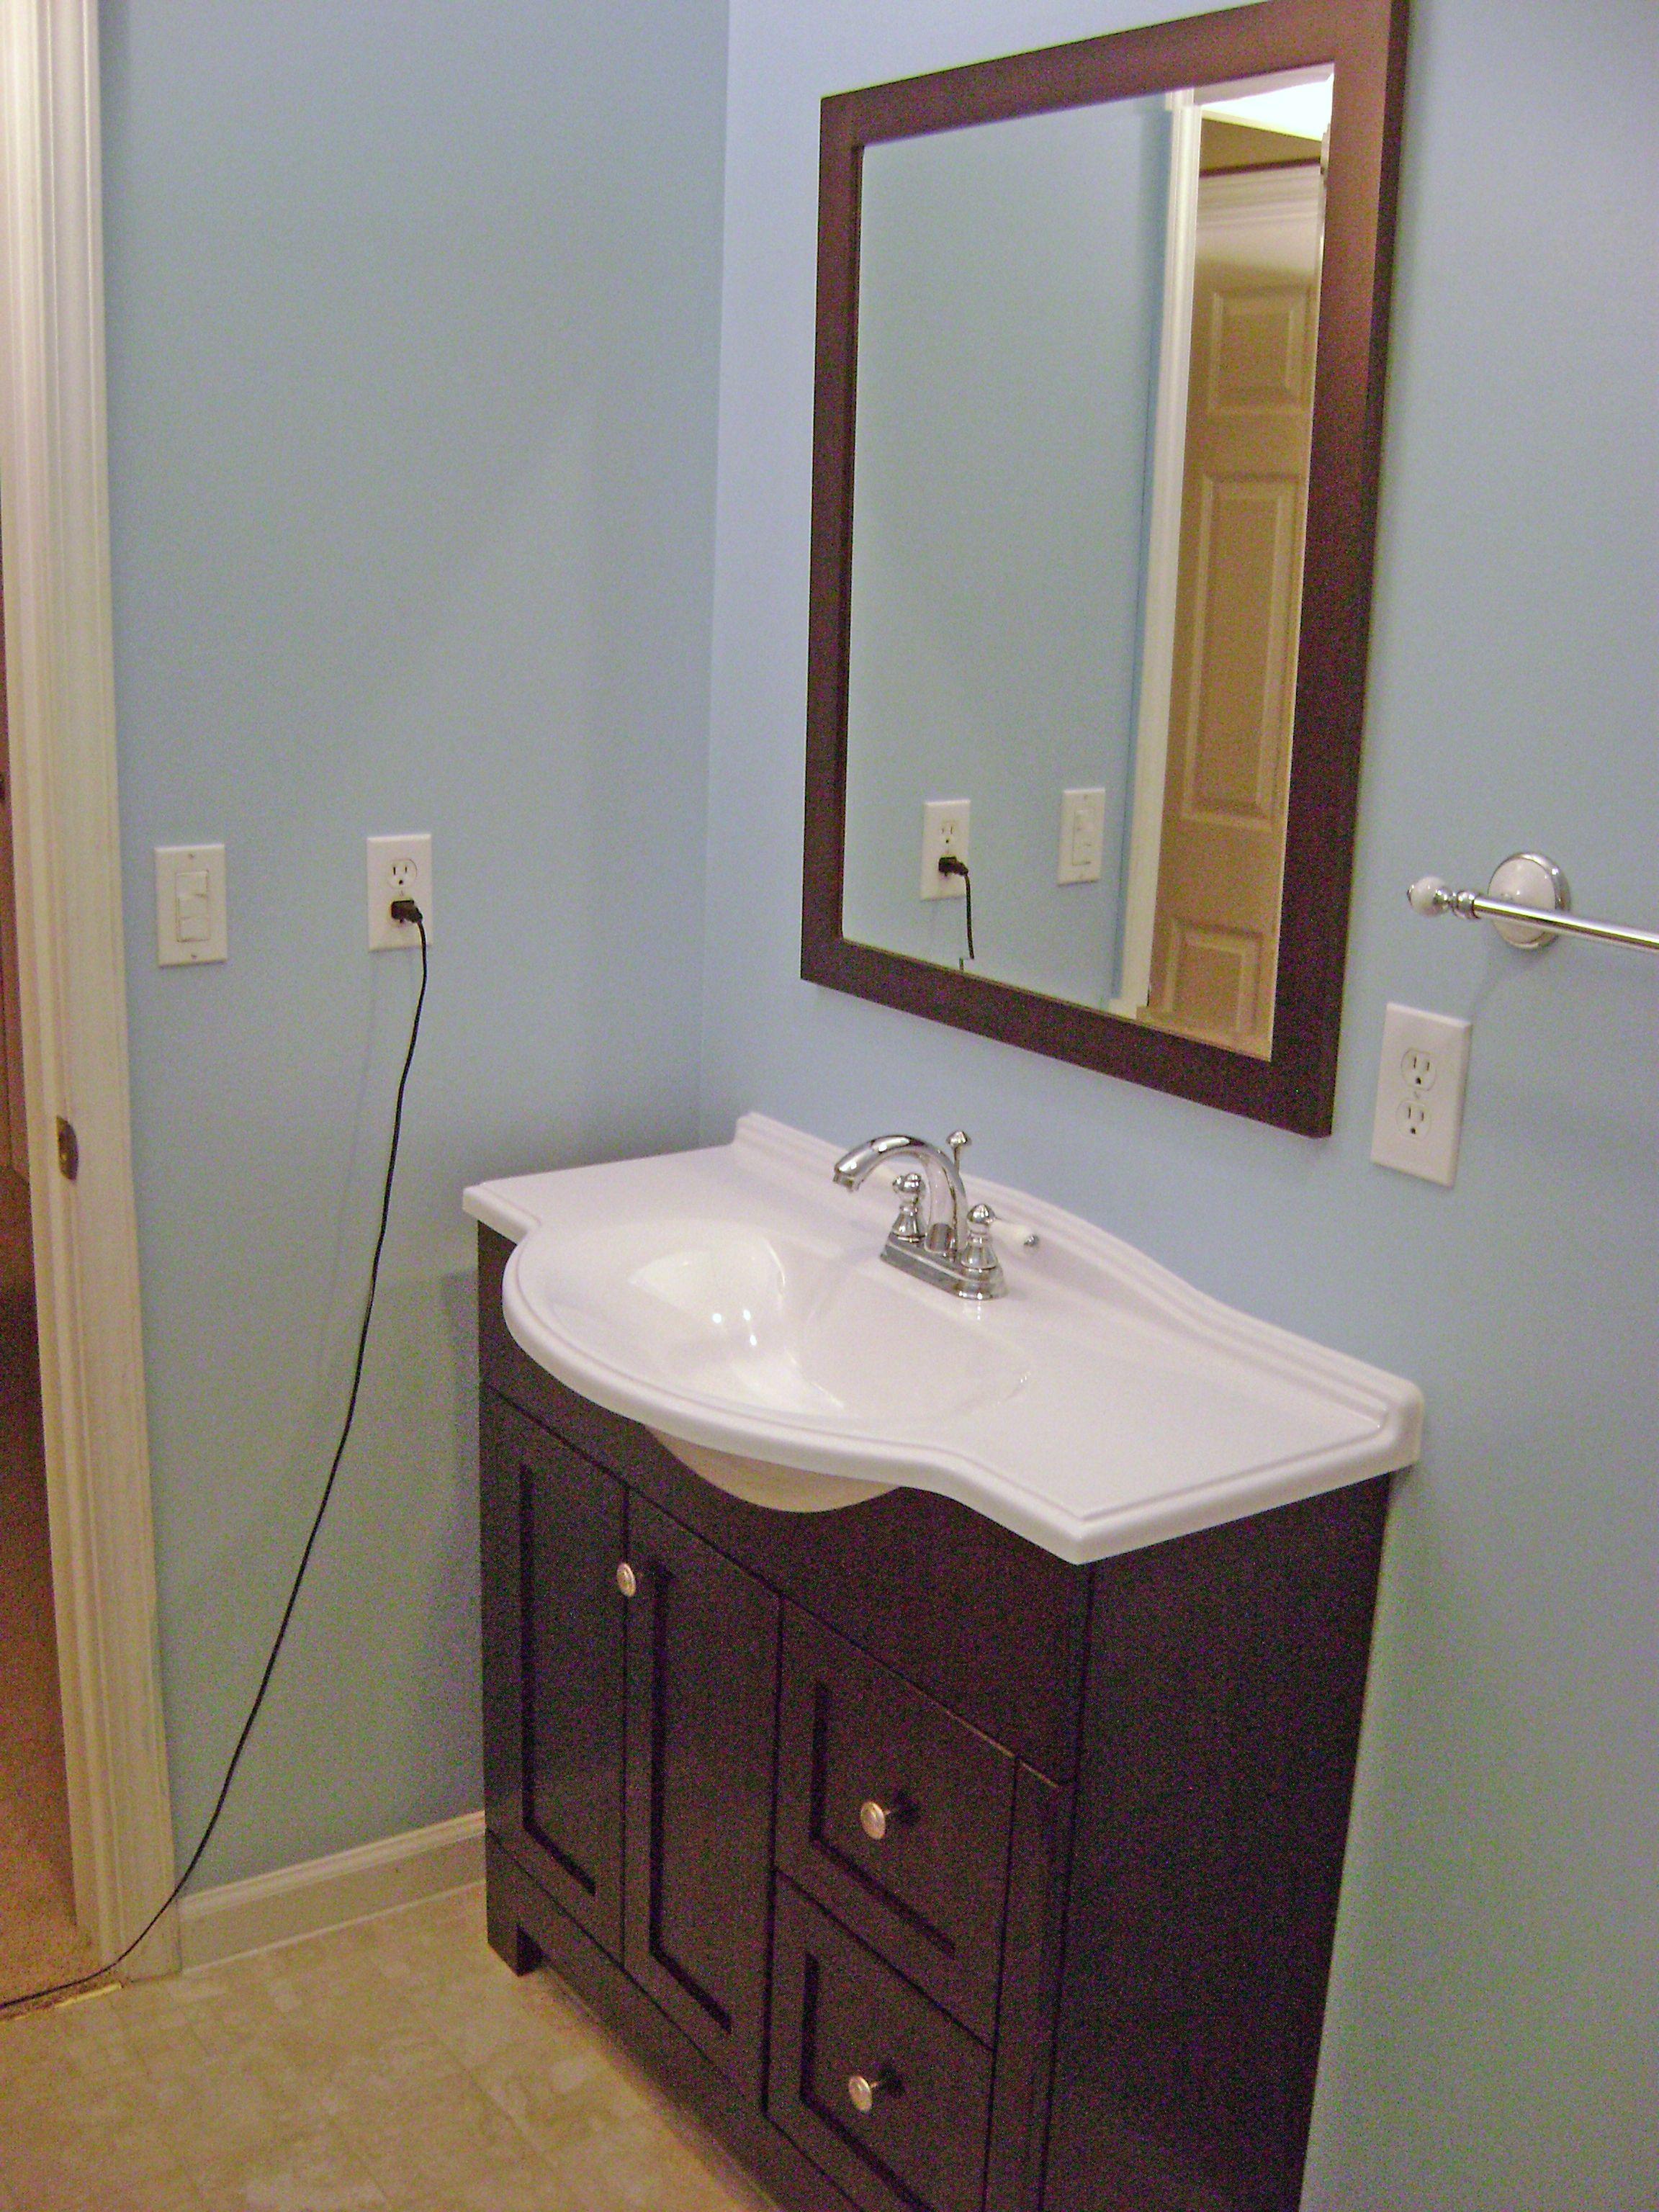 How To Finish A Basement Bathroom Vanity Plumbing Small